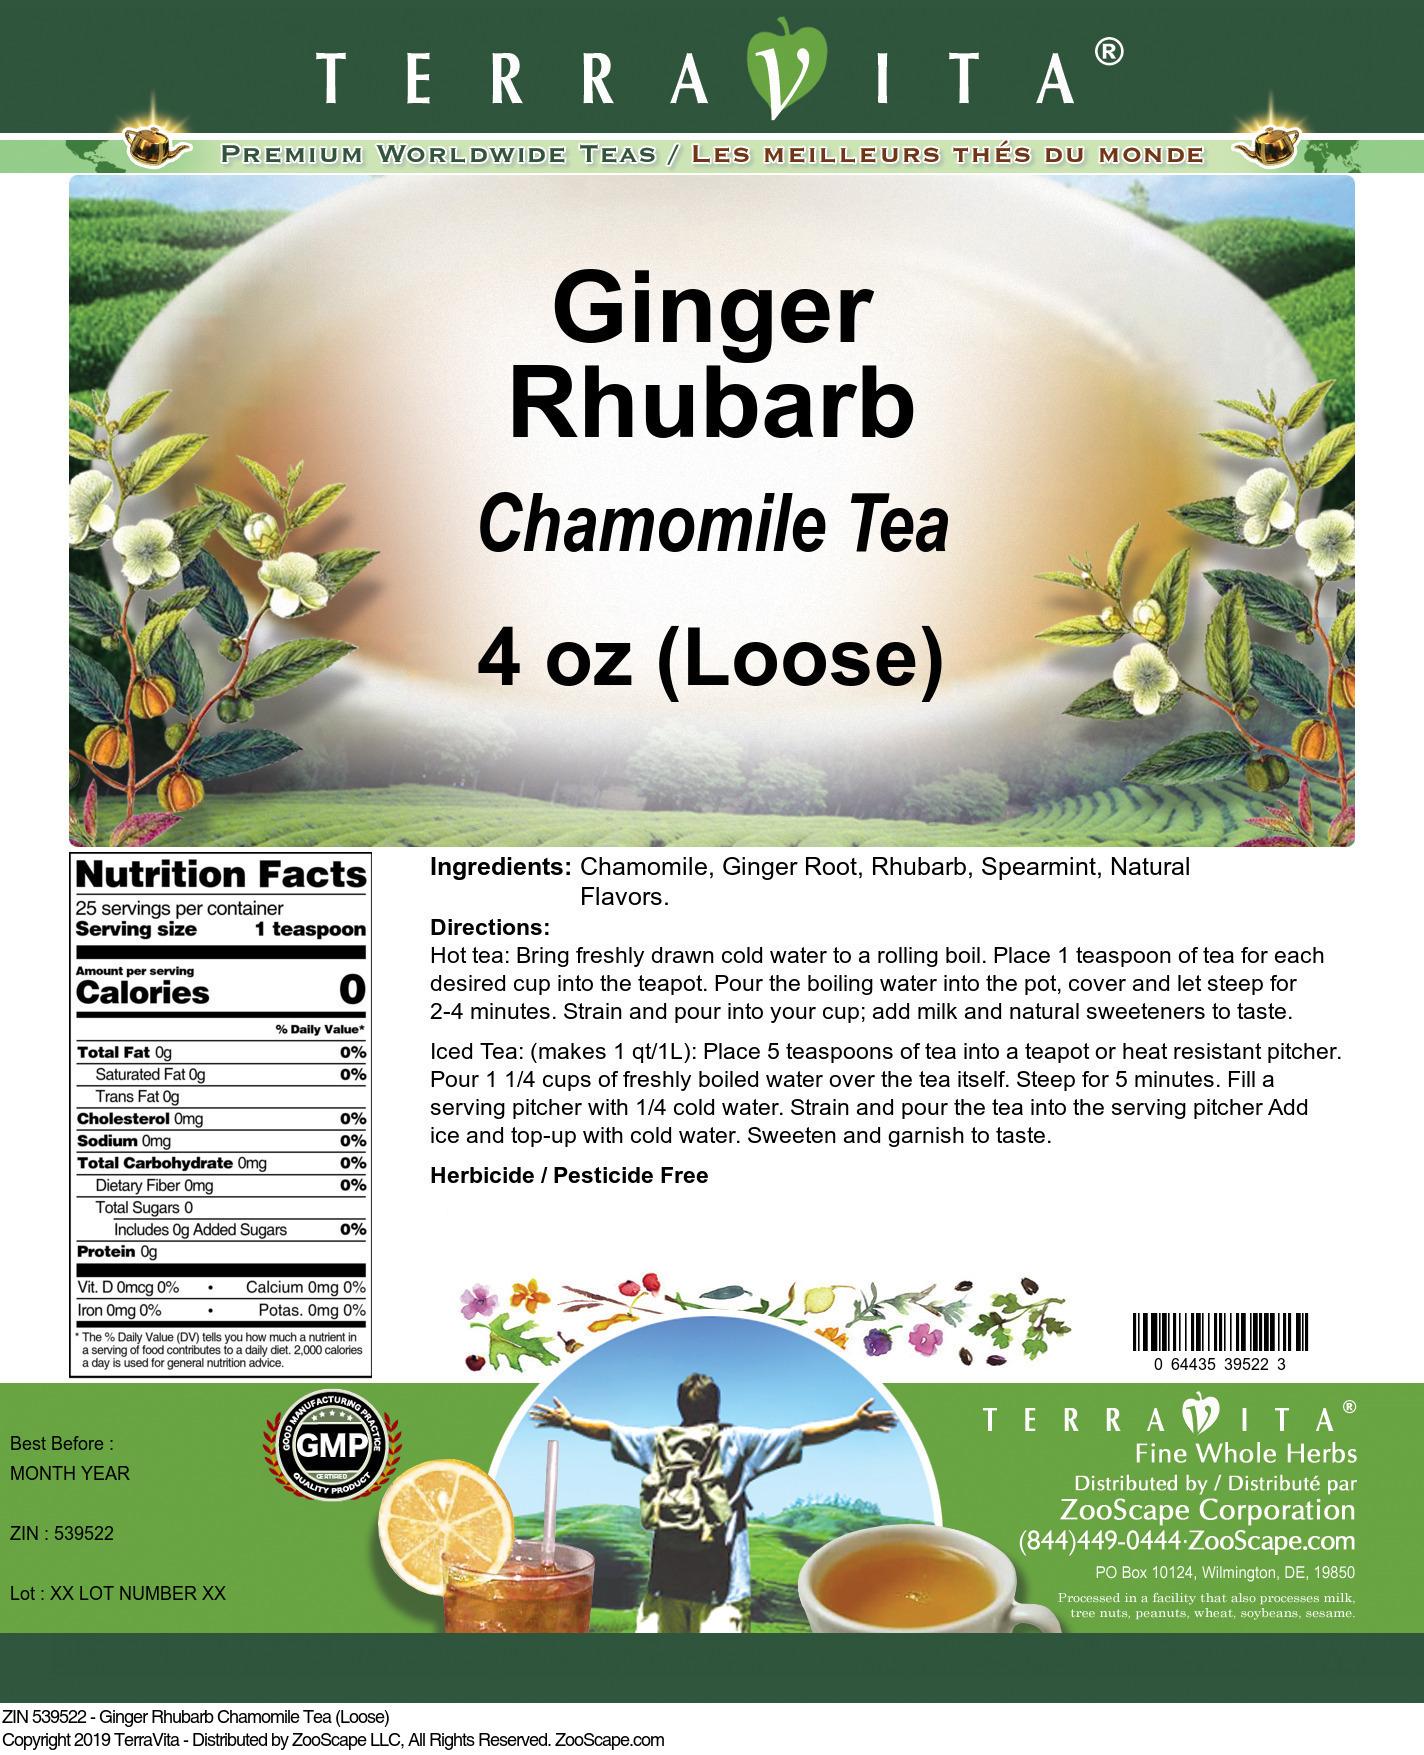 Ginger Rhubarb Chamomile Tea